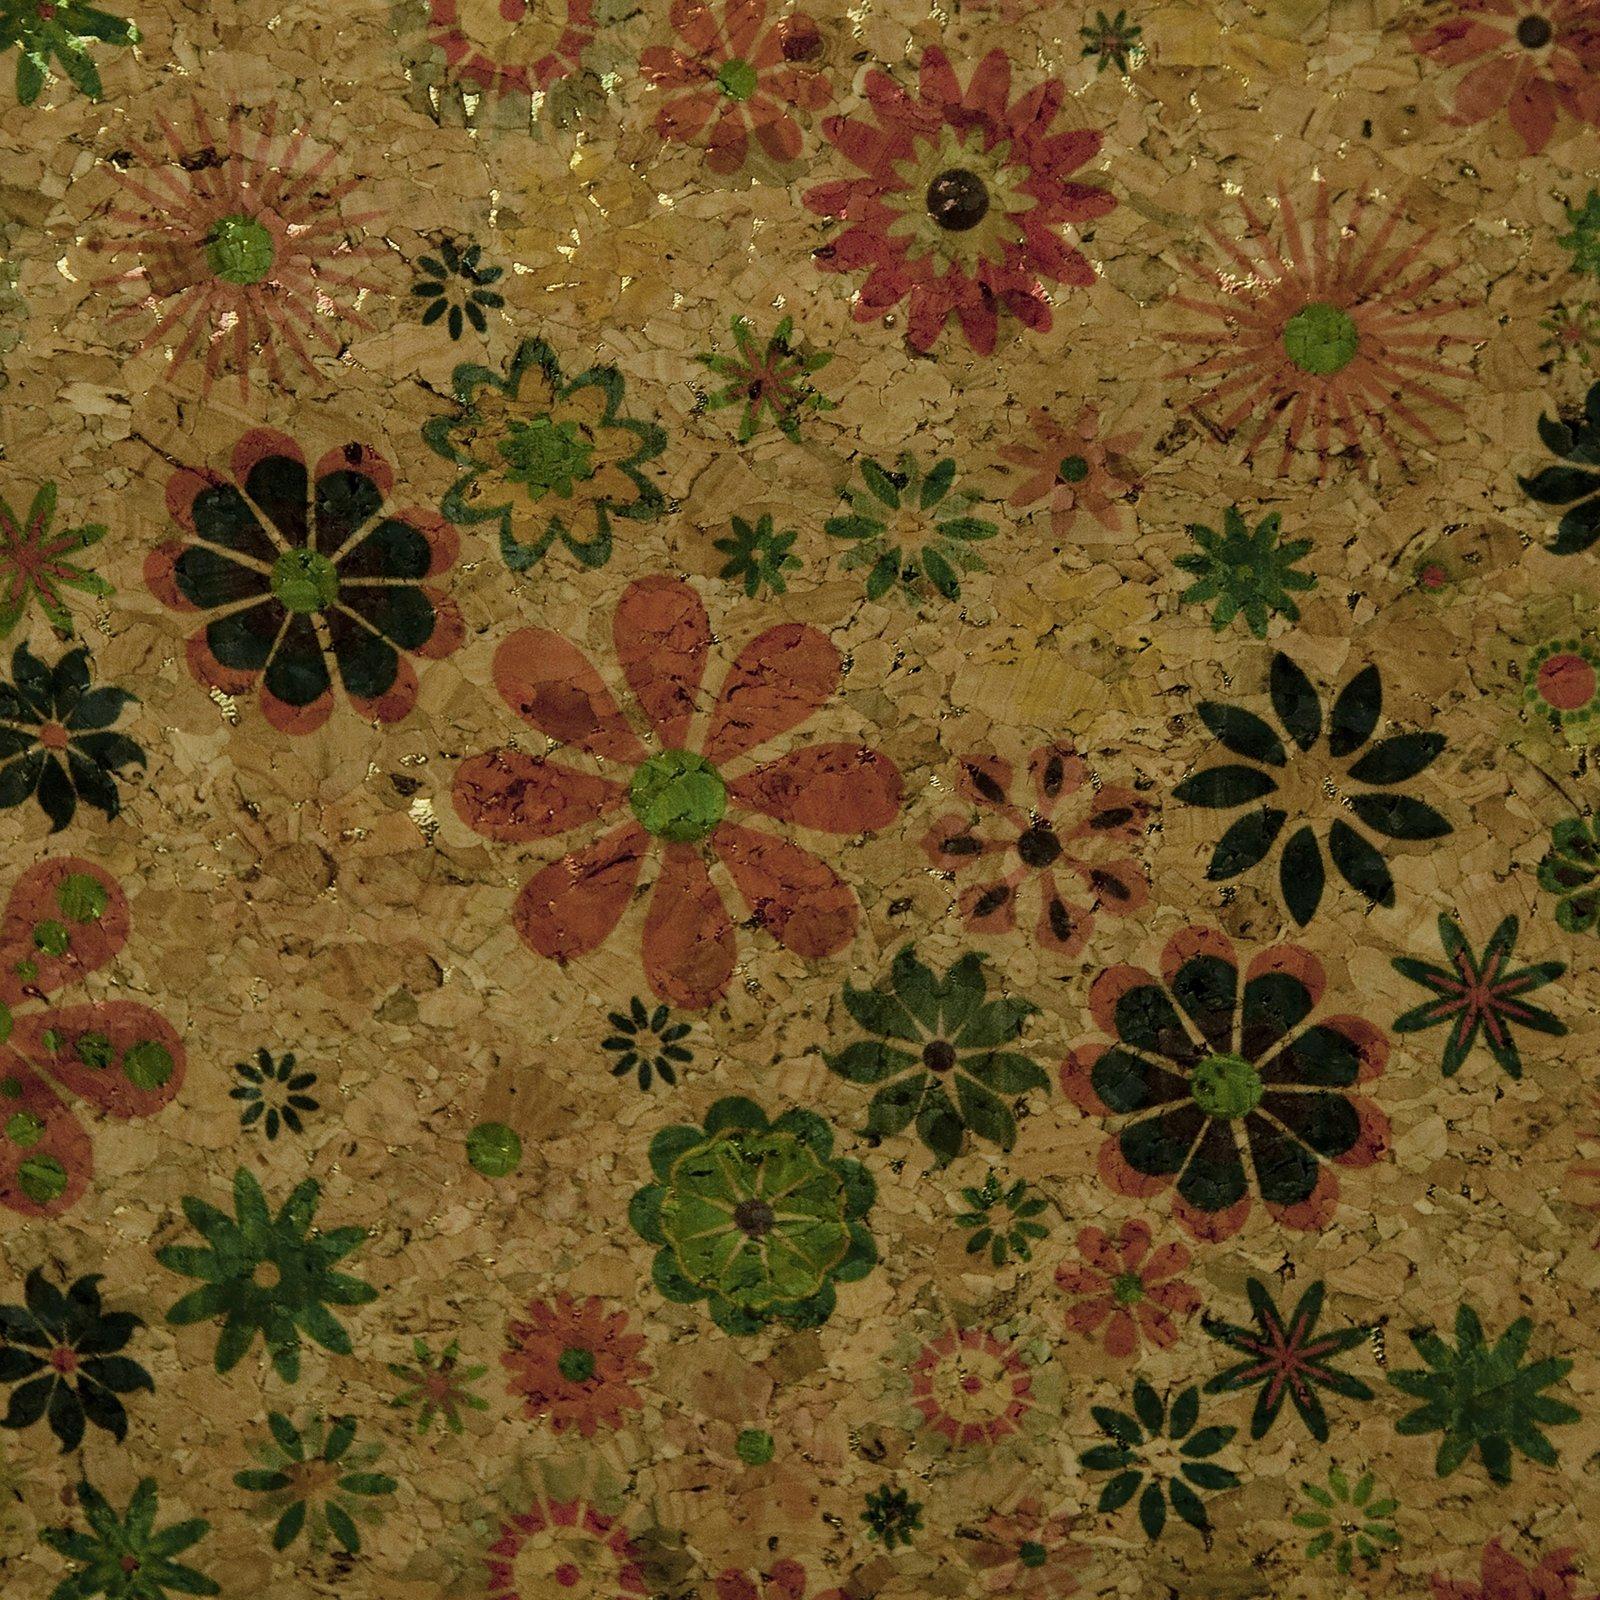 Cork Fabric - 18 x 15 plain floral